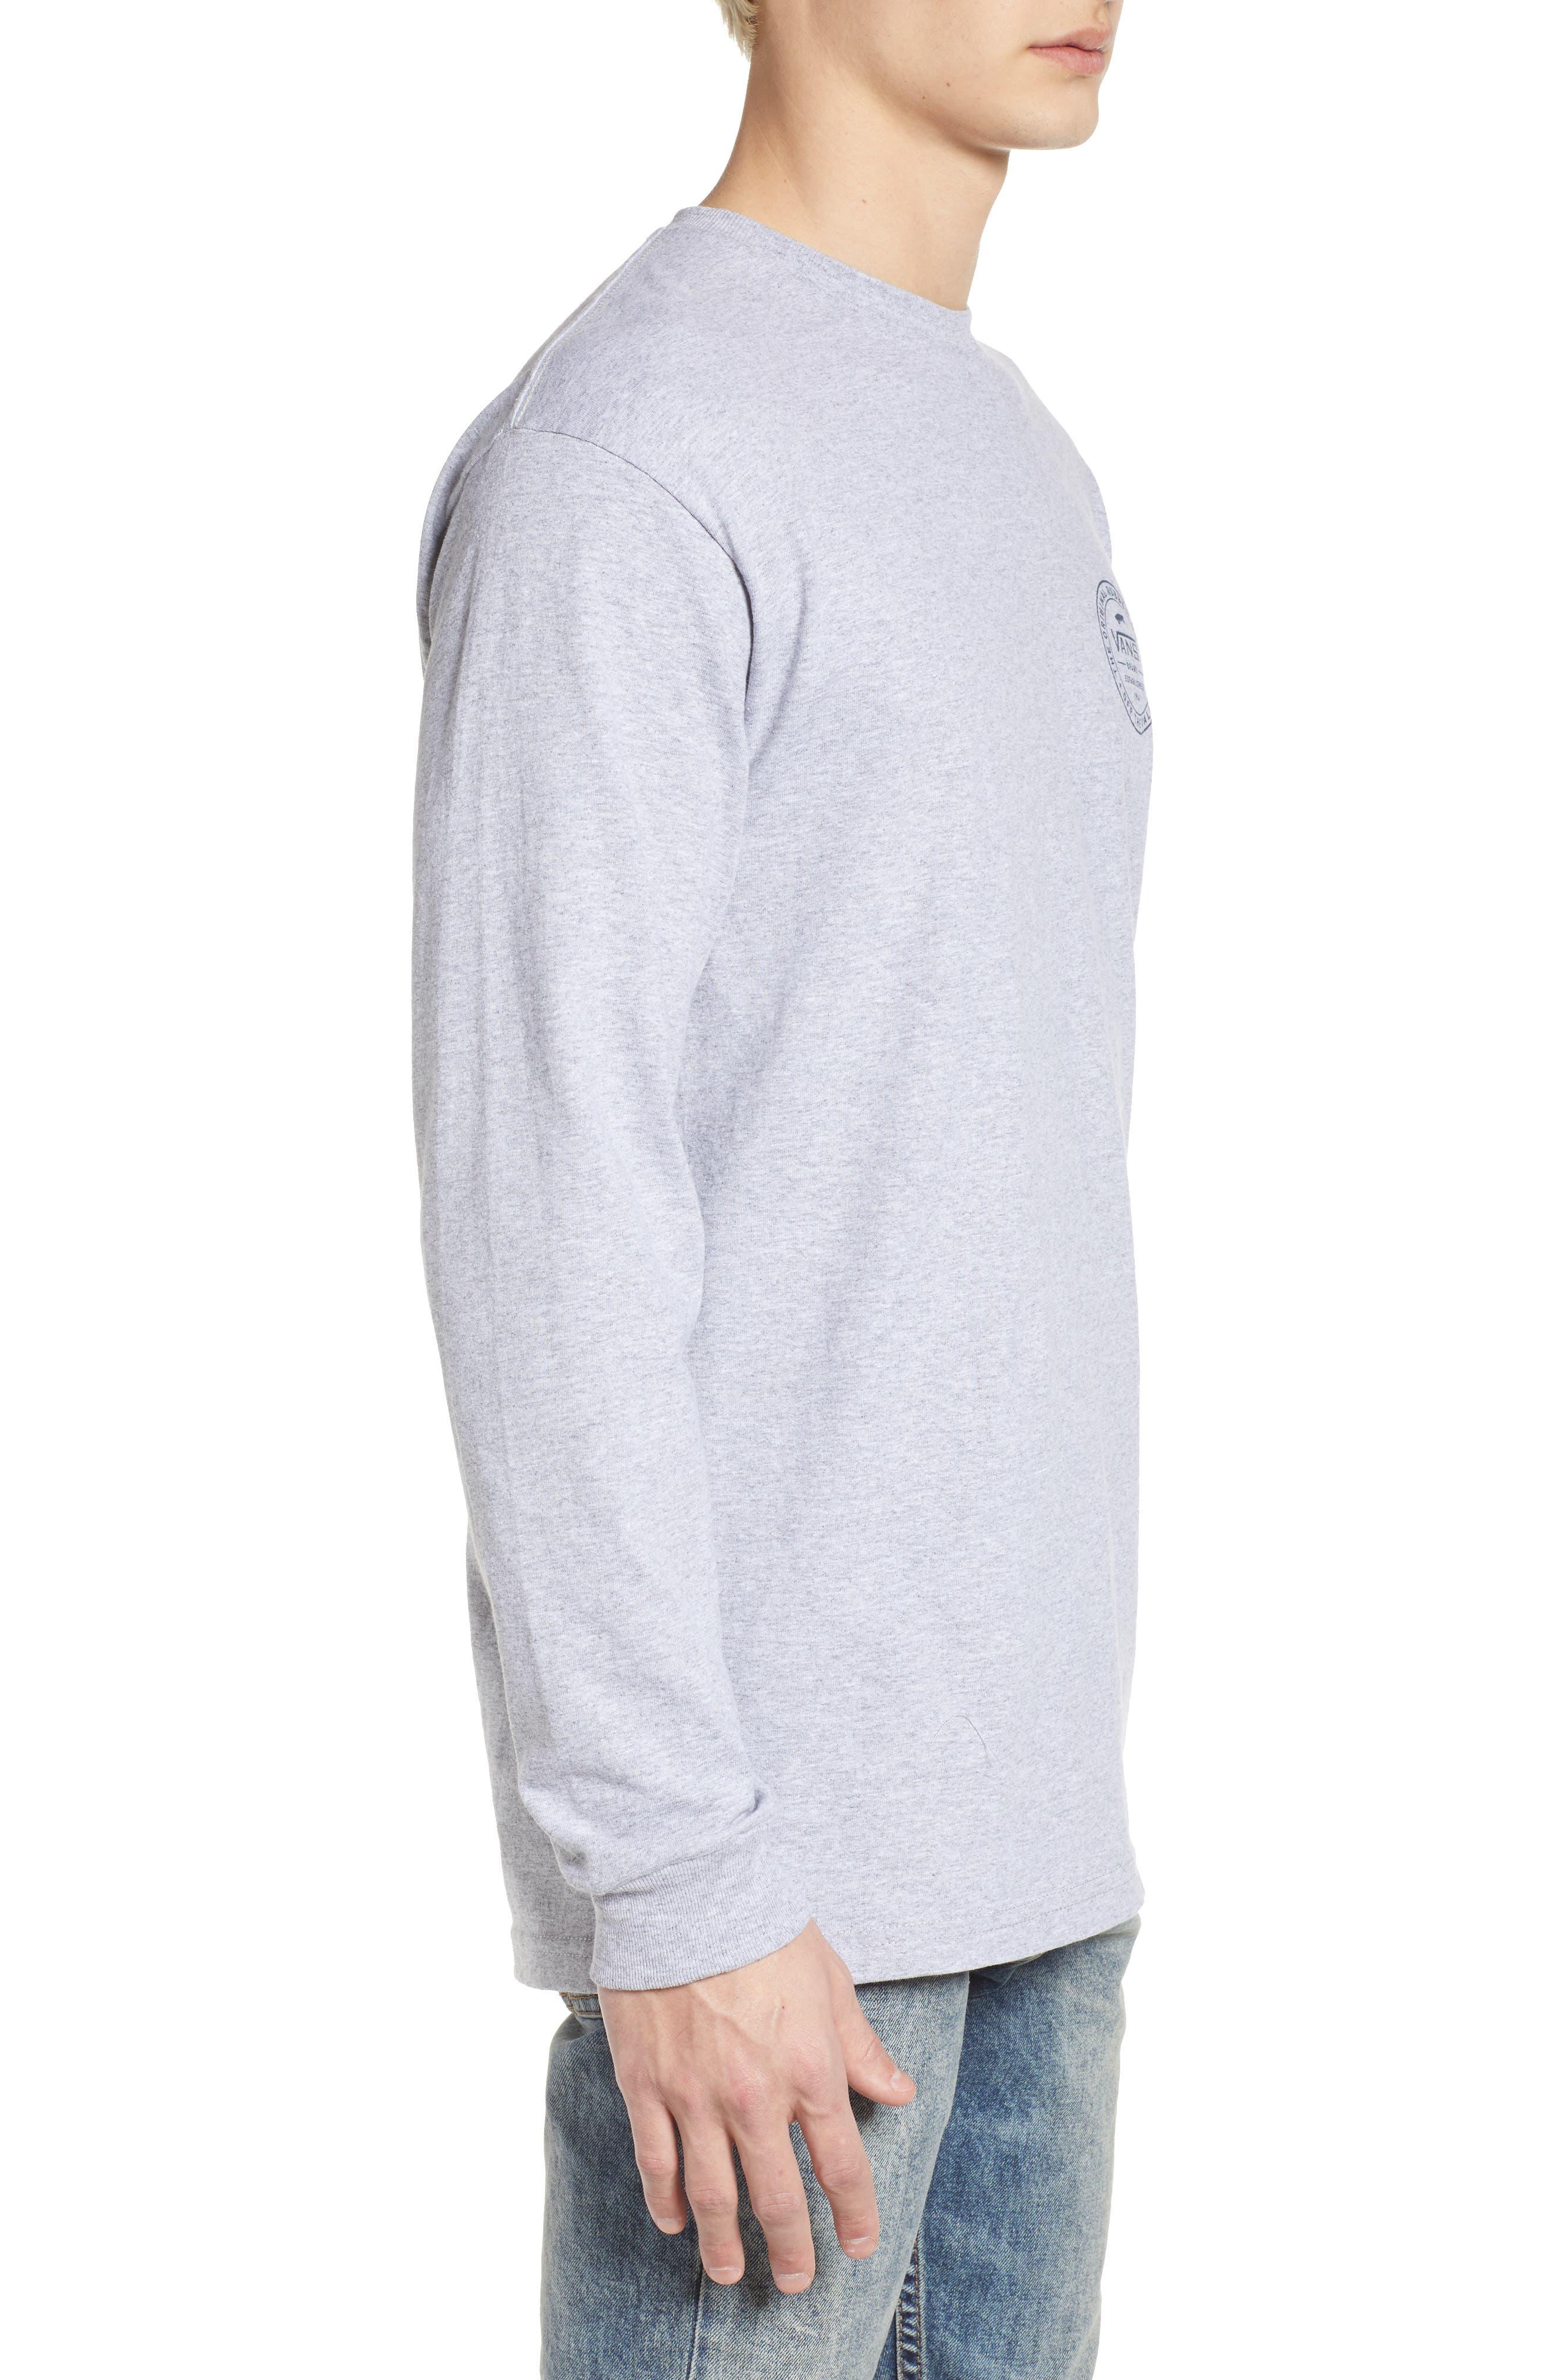 Established '66 Graphic T-Shirt,                             Alternate thumbnail 3, color,                             Grey